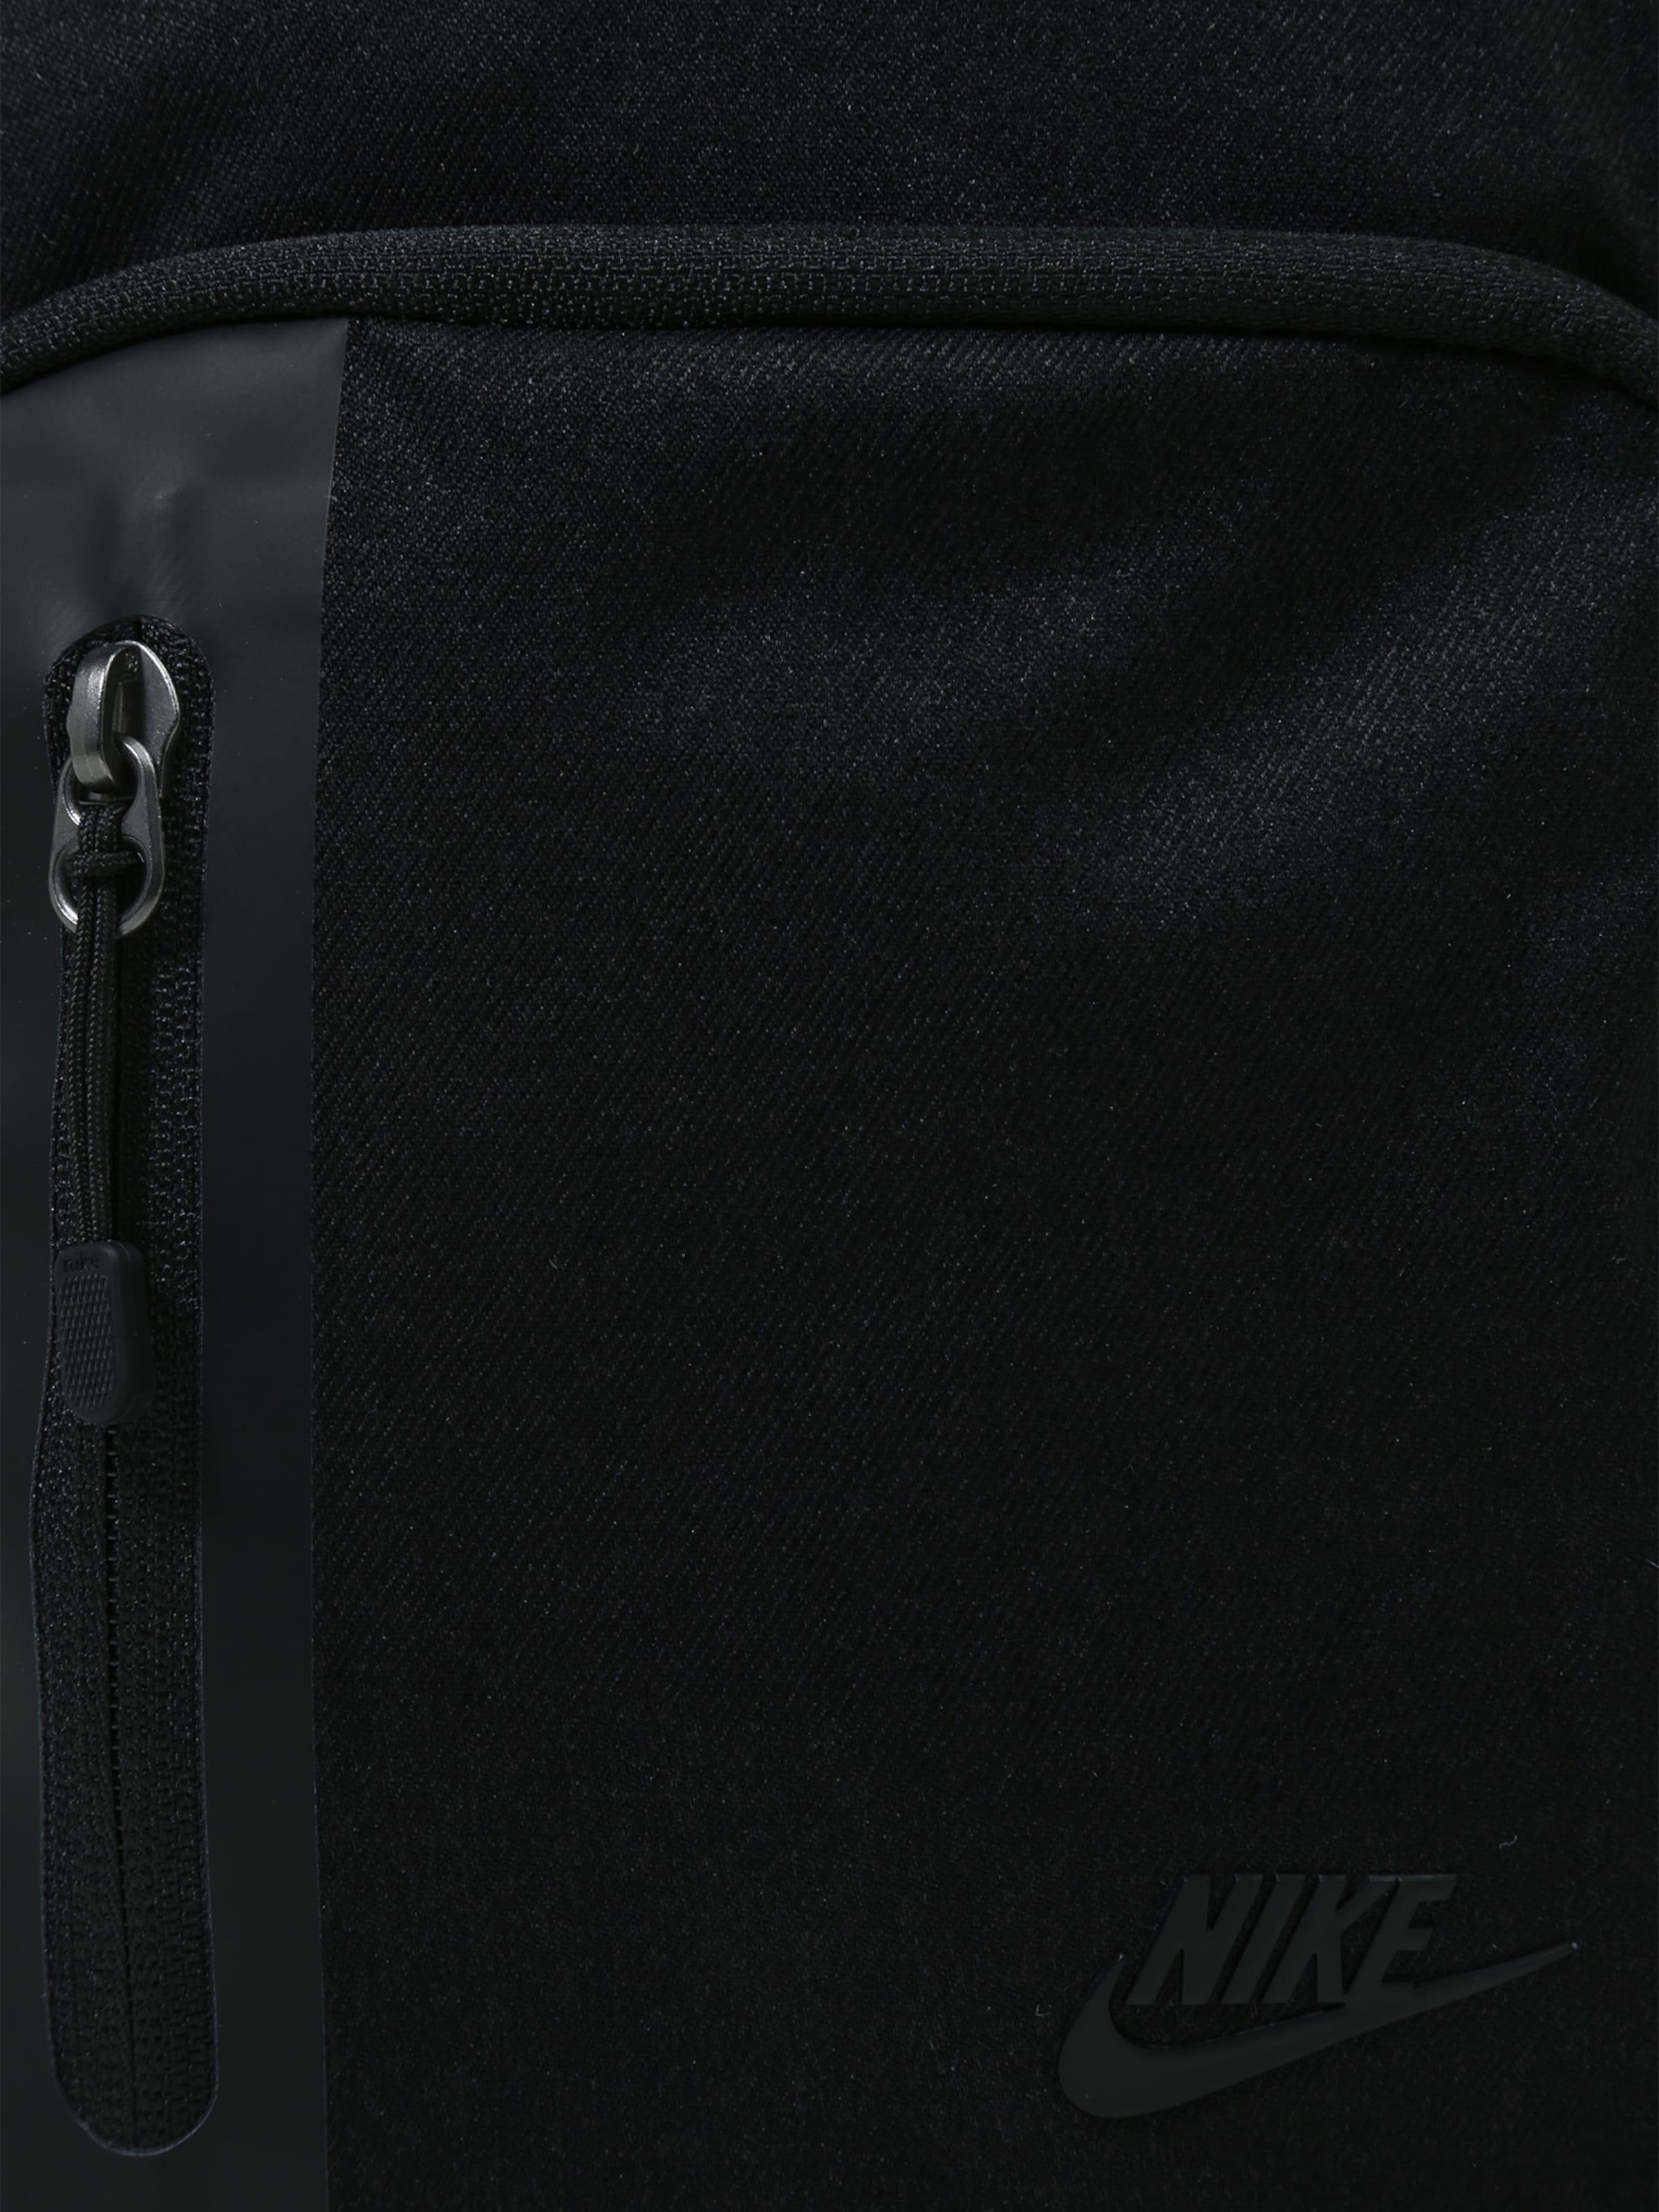 Sac Nike Sportswear Items En Small À GrisNoir 0' 3 Bandoulière 'core rdthQCs